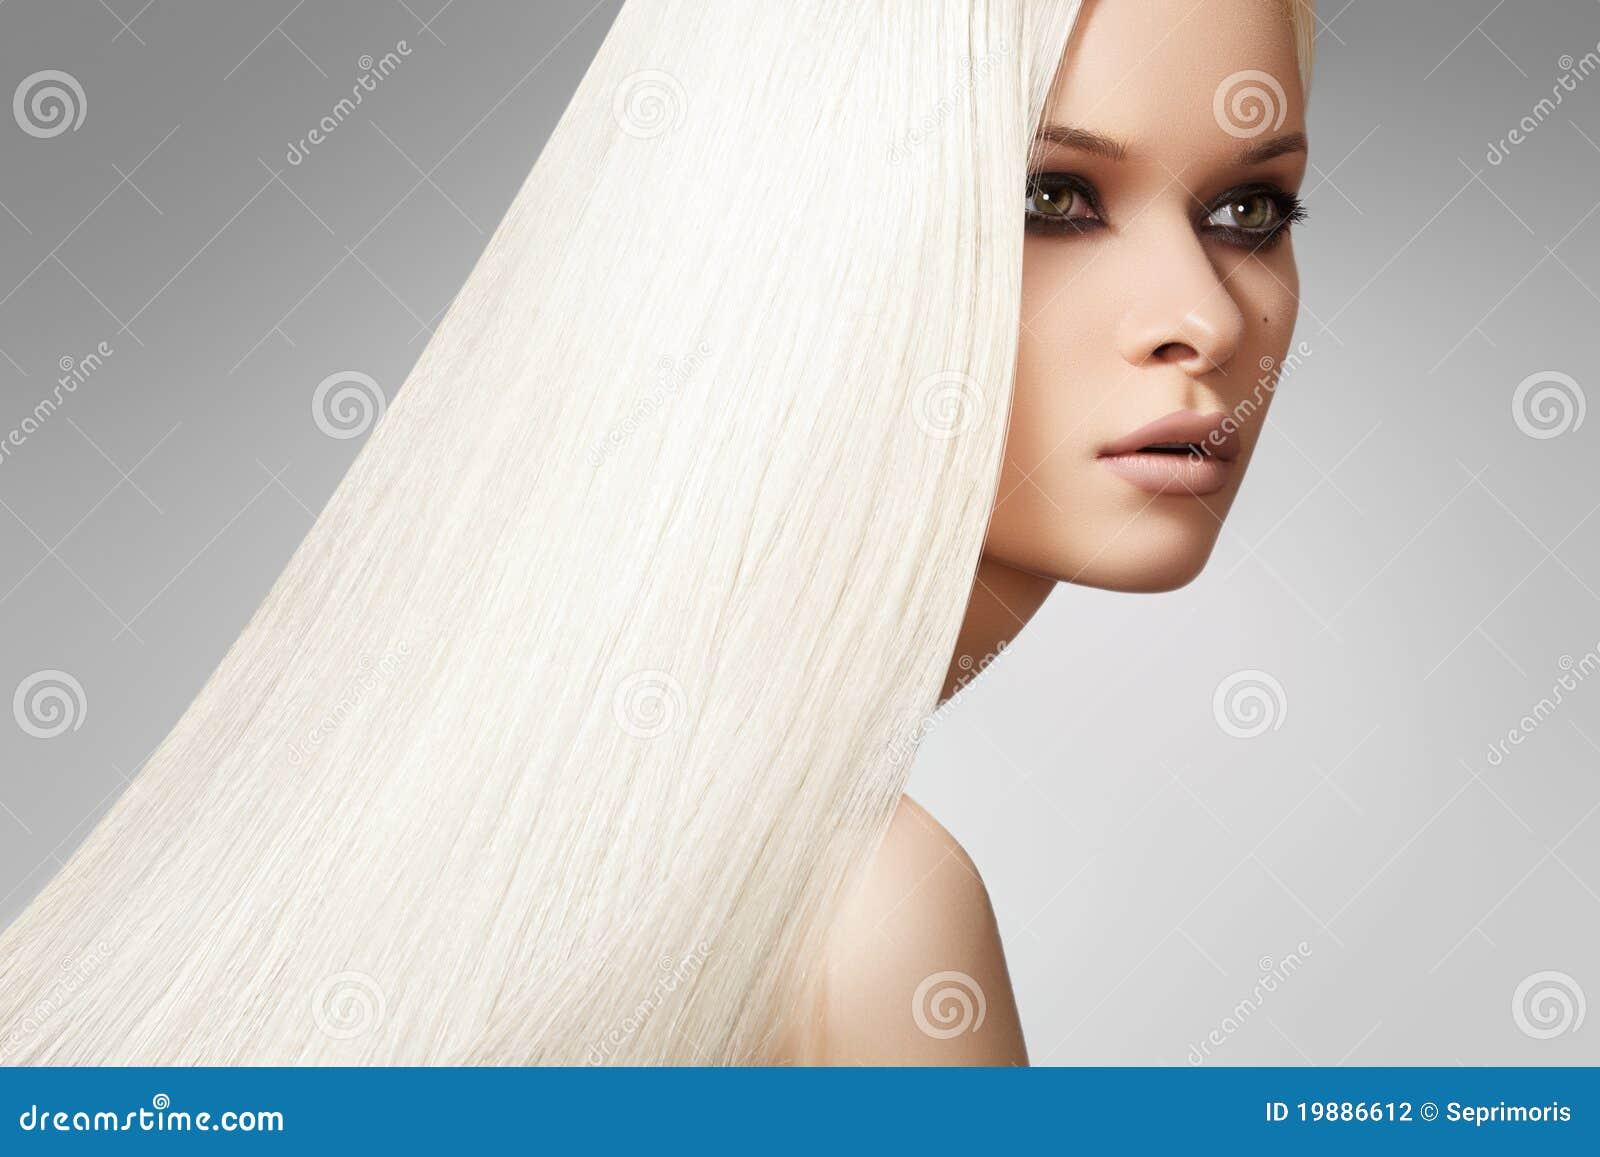 Beautiful model, long blond straight hair style